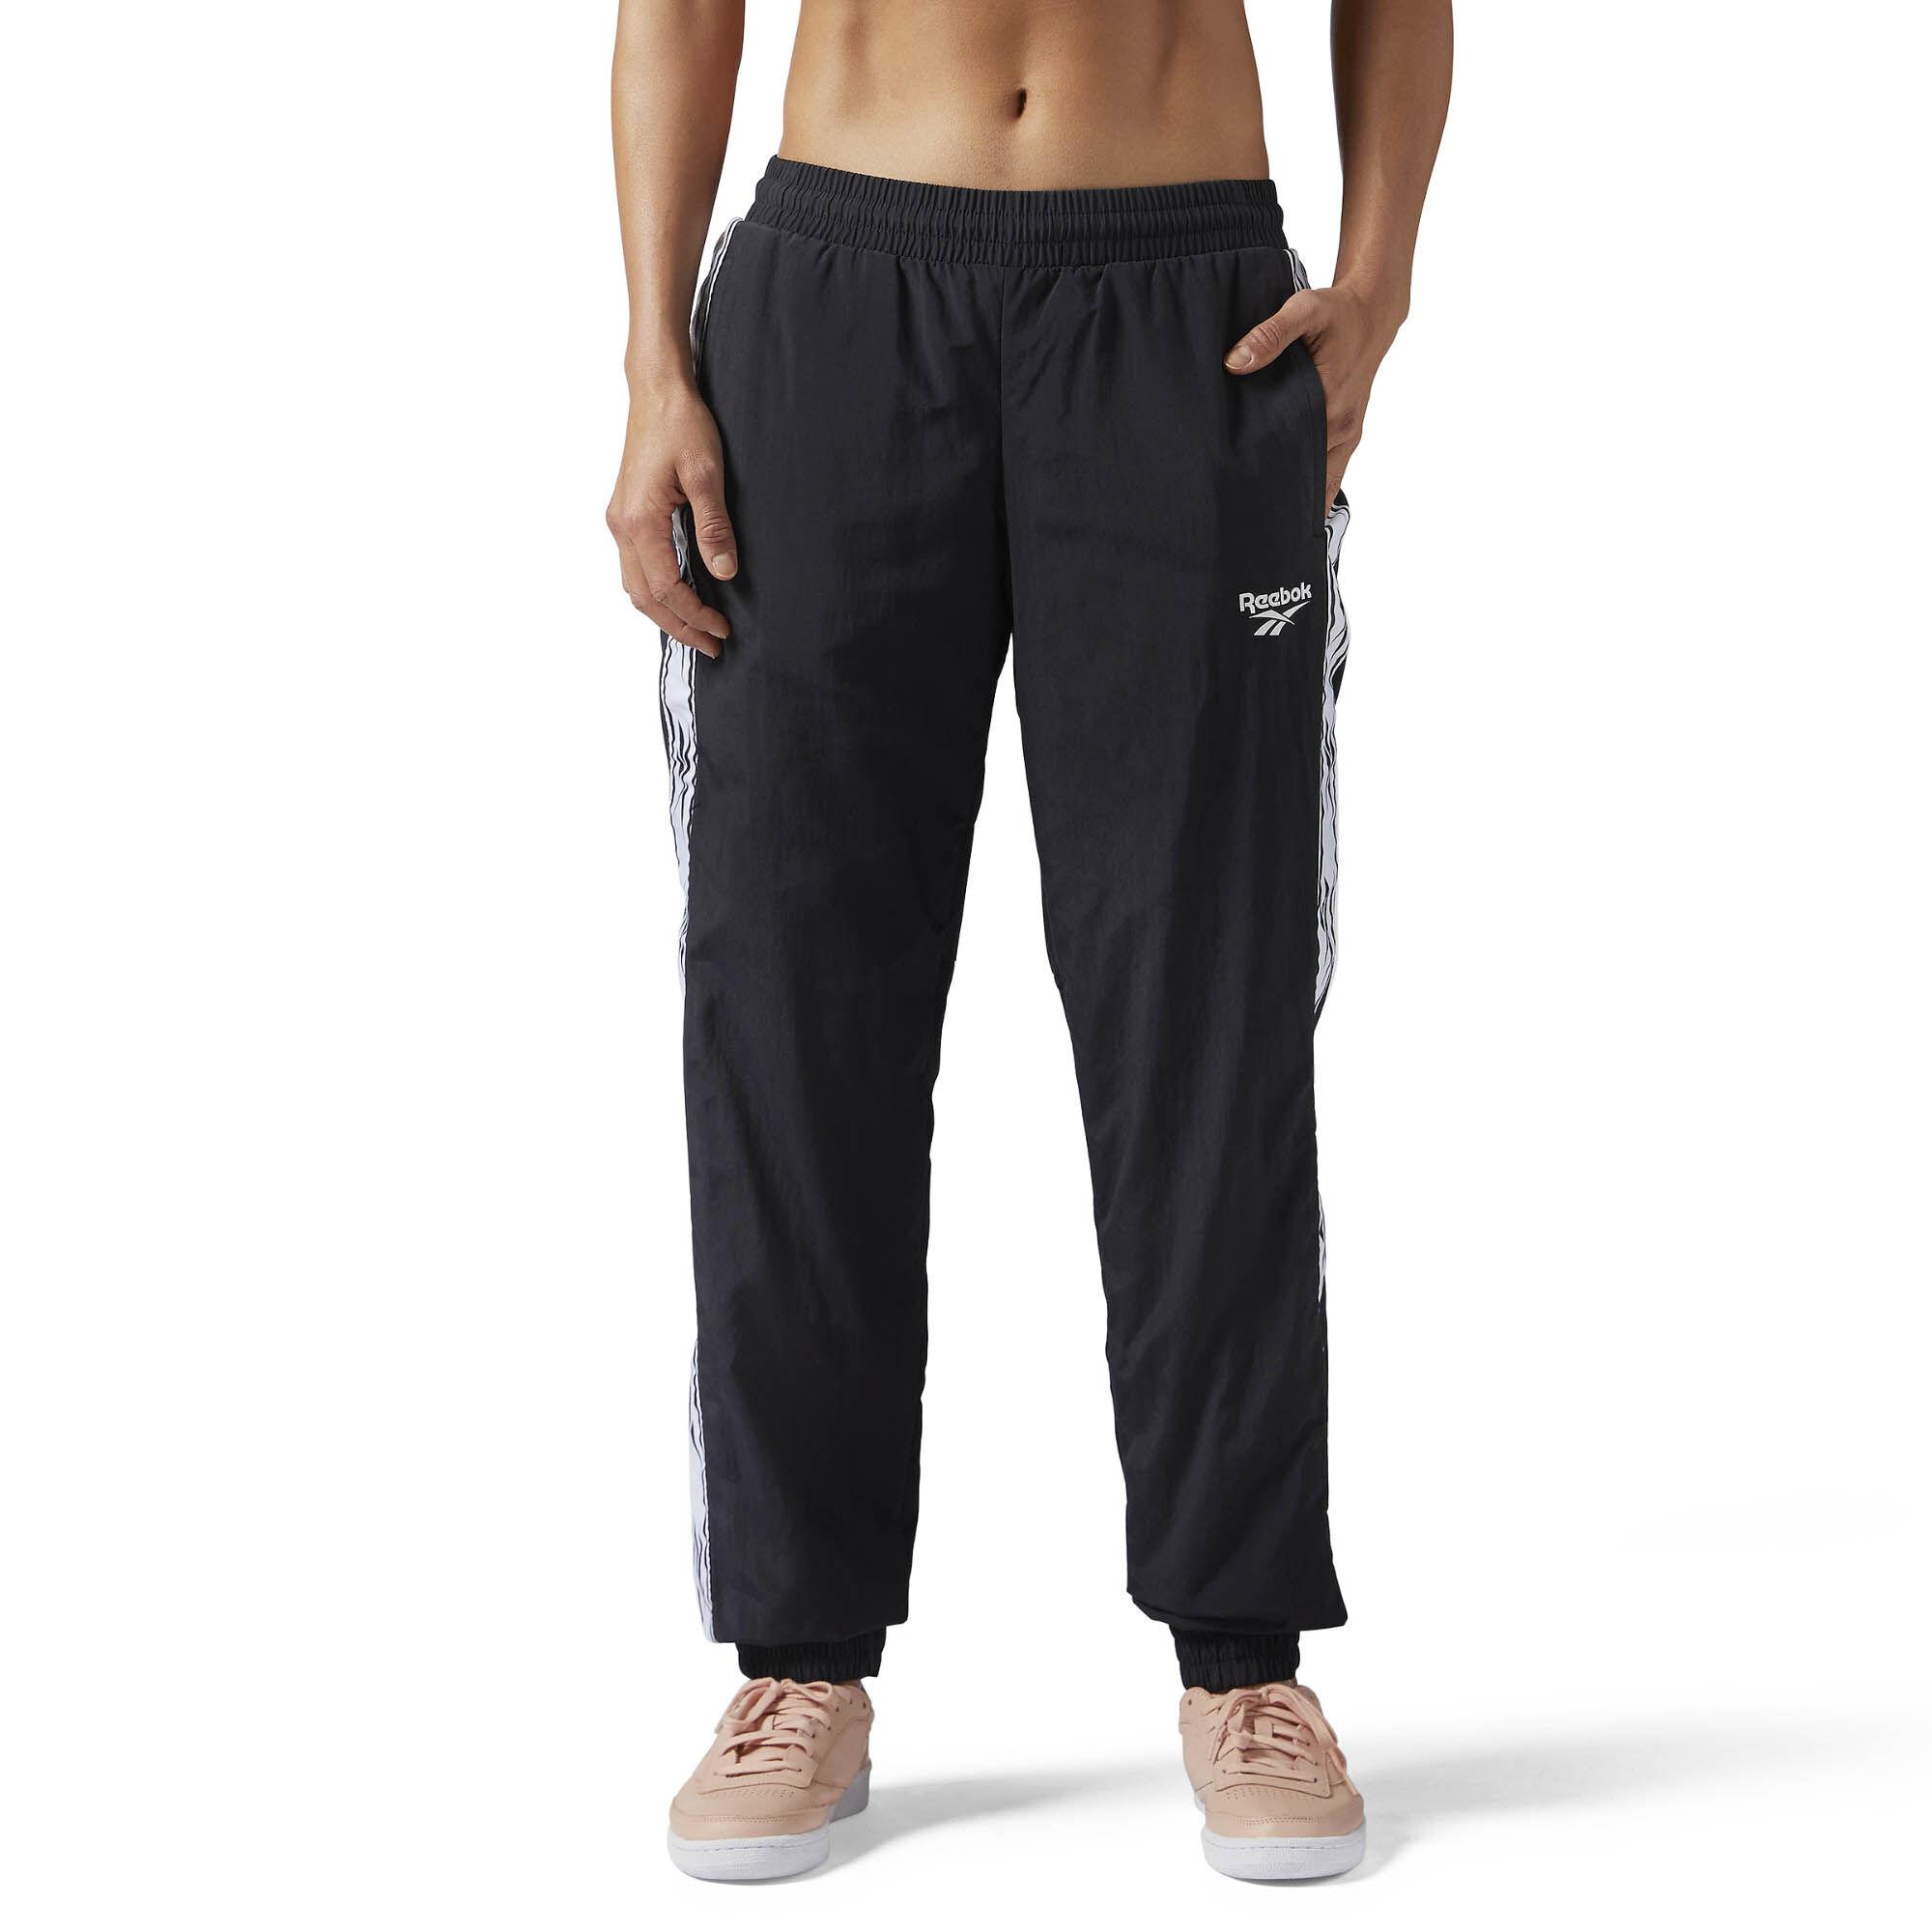 d75b1f60a4b21d reebok classic sweatpants womens black cheap   OFF36% The Largest ...